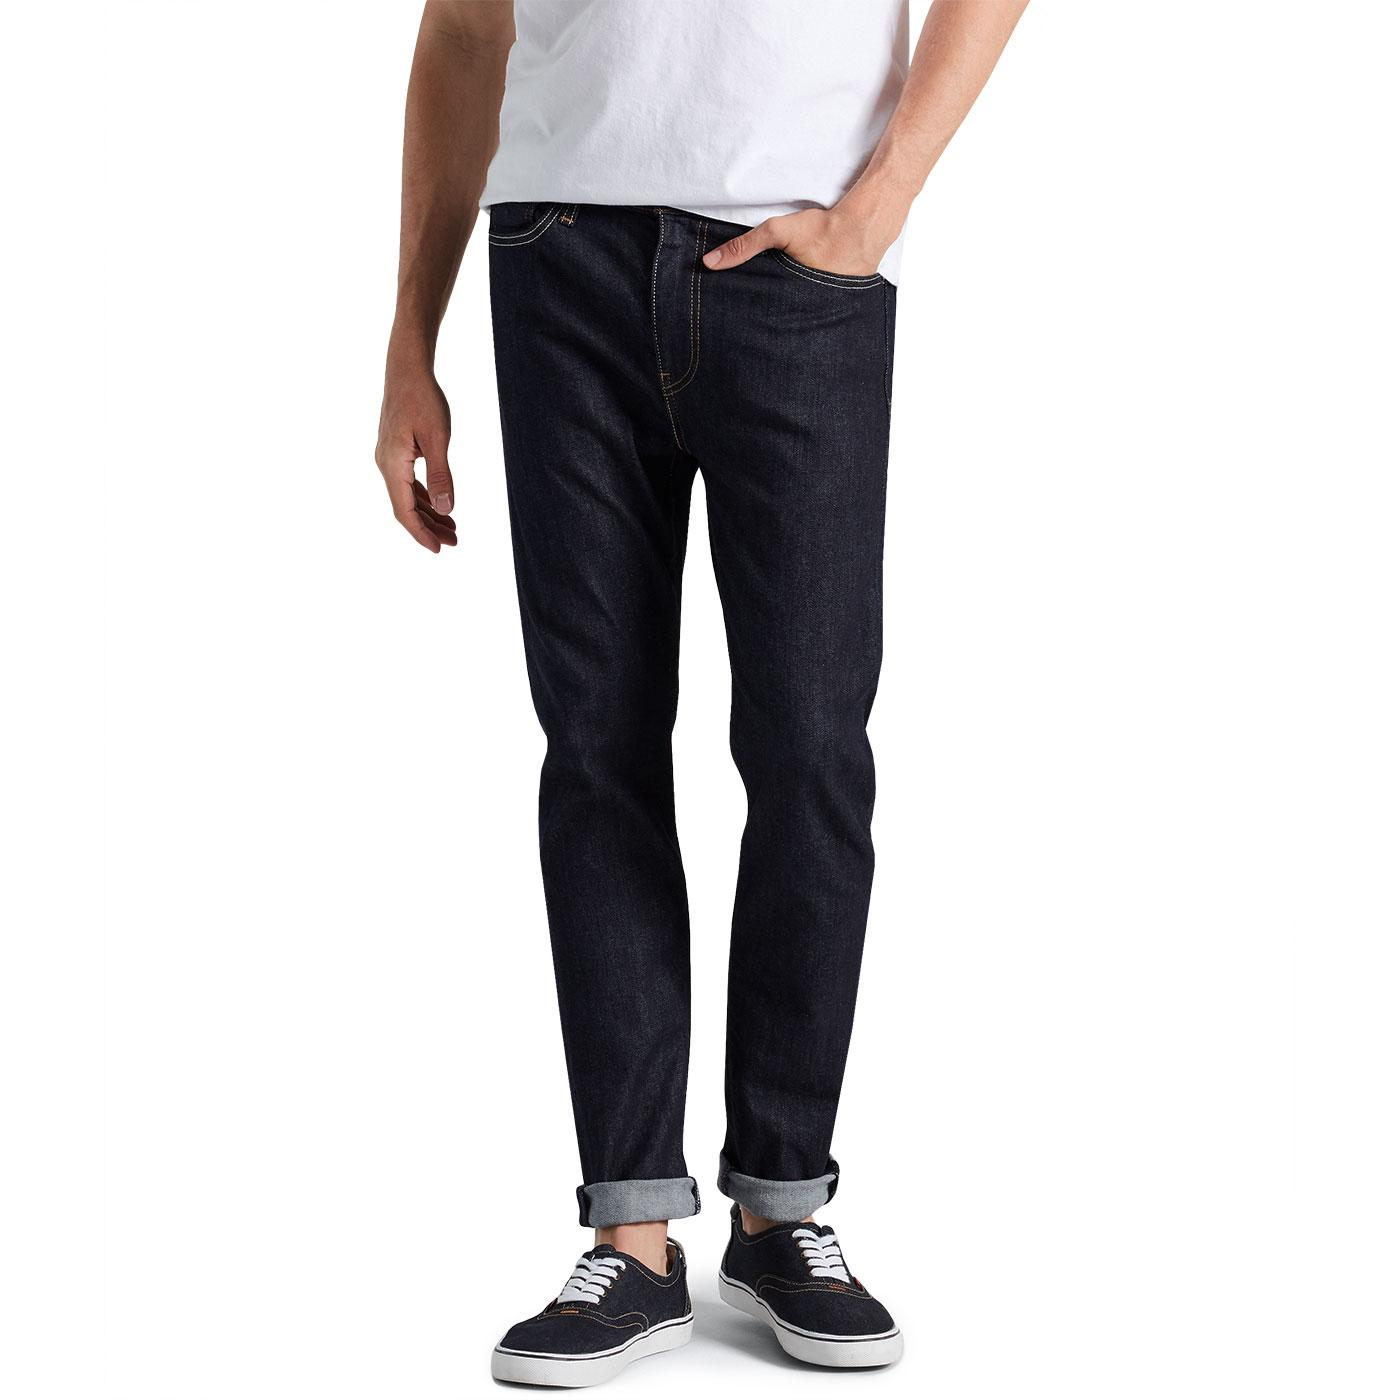 LEVI'S 510 Men's Retro Skinny Jeans CLEANER ADV.